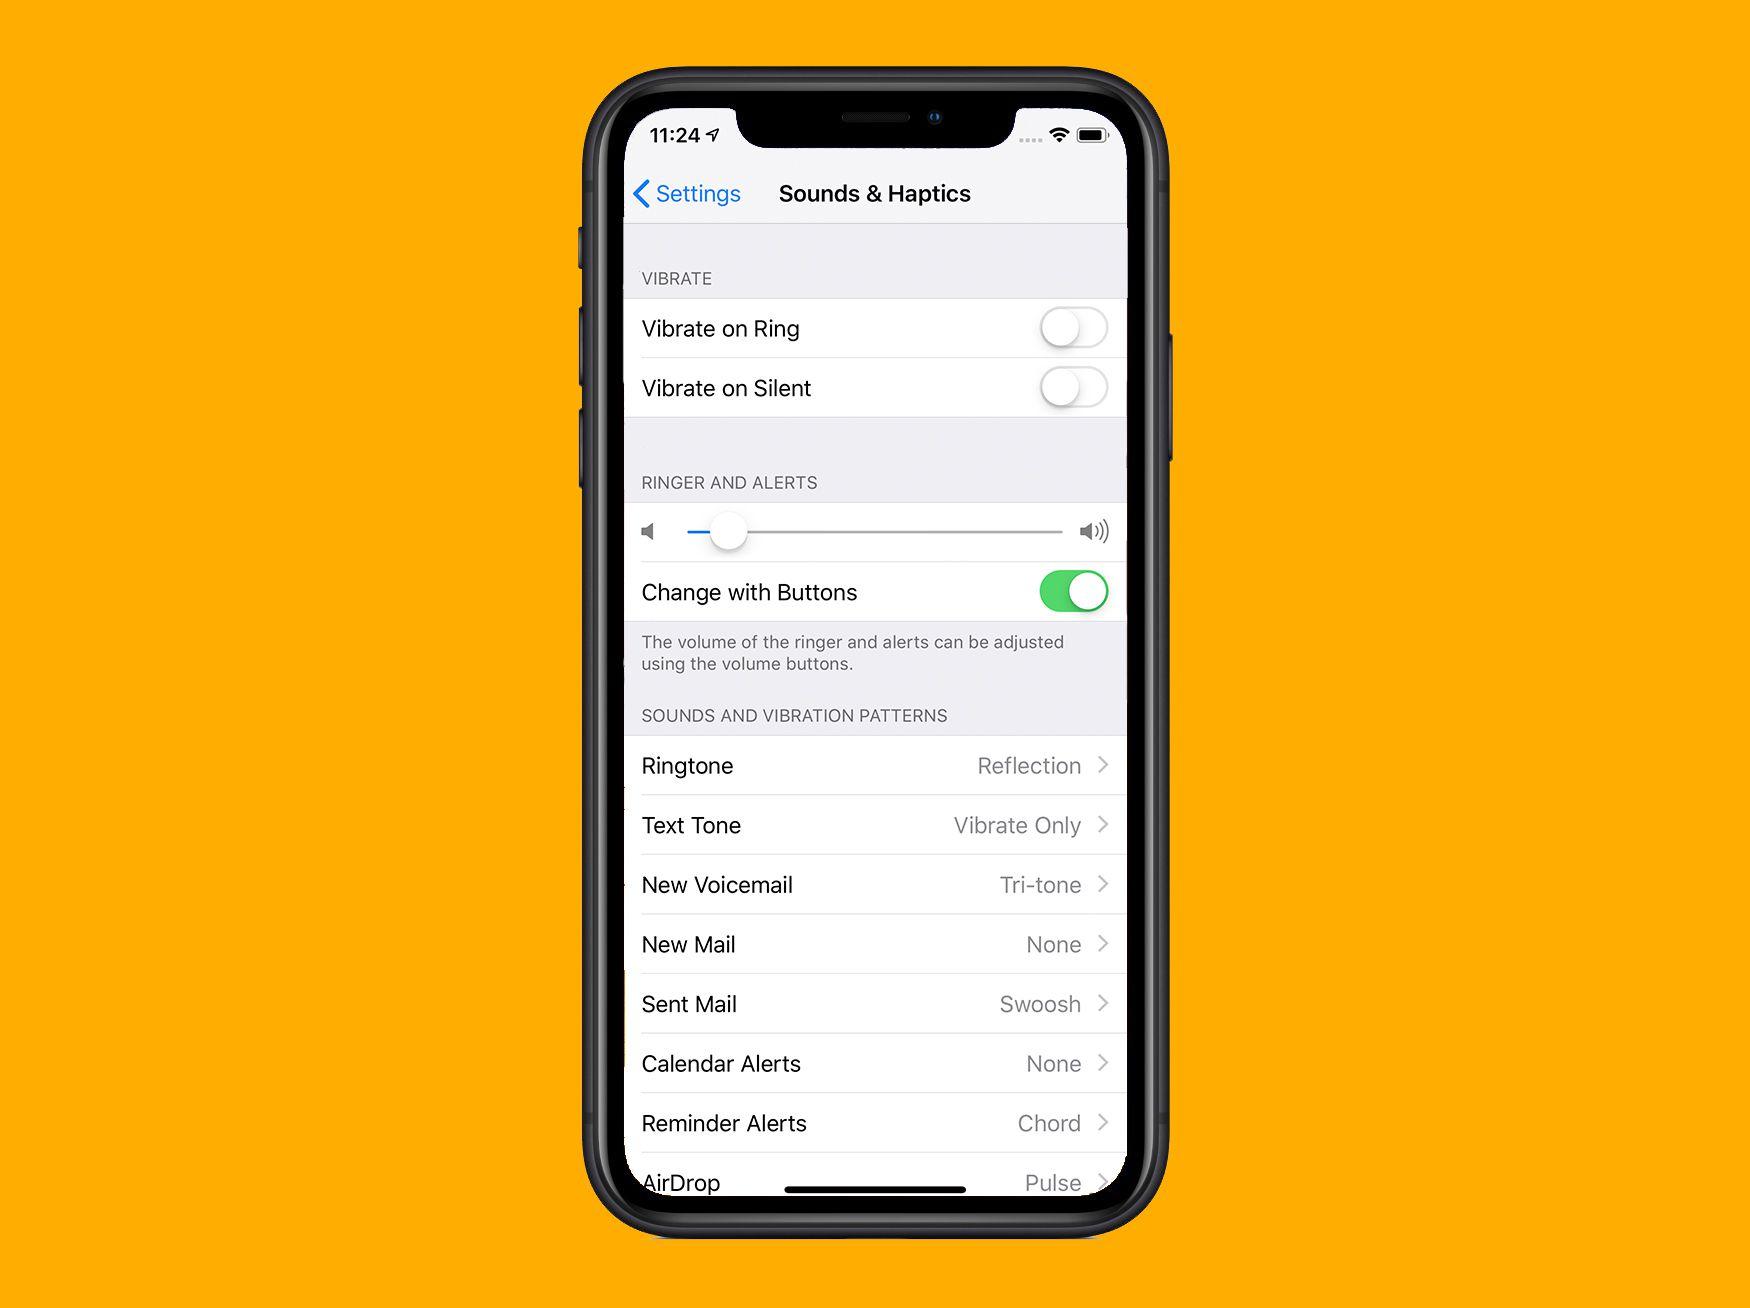 iPhone Speaker Not Working? 8 Ways to Fix It